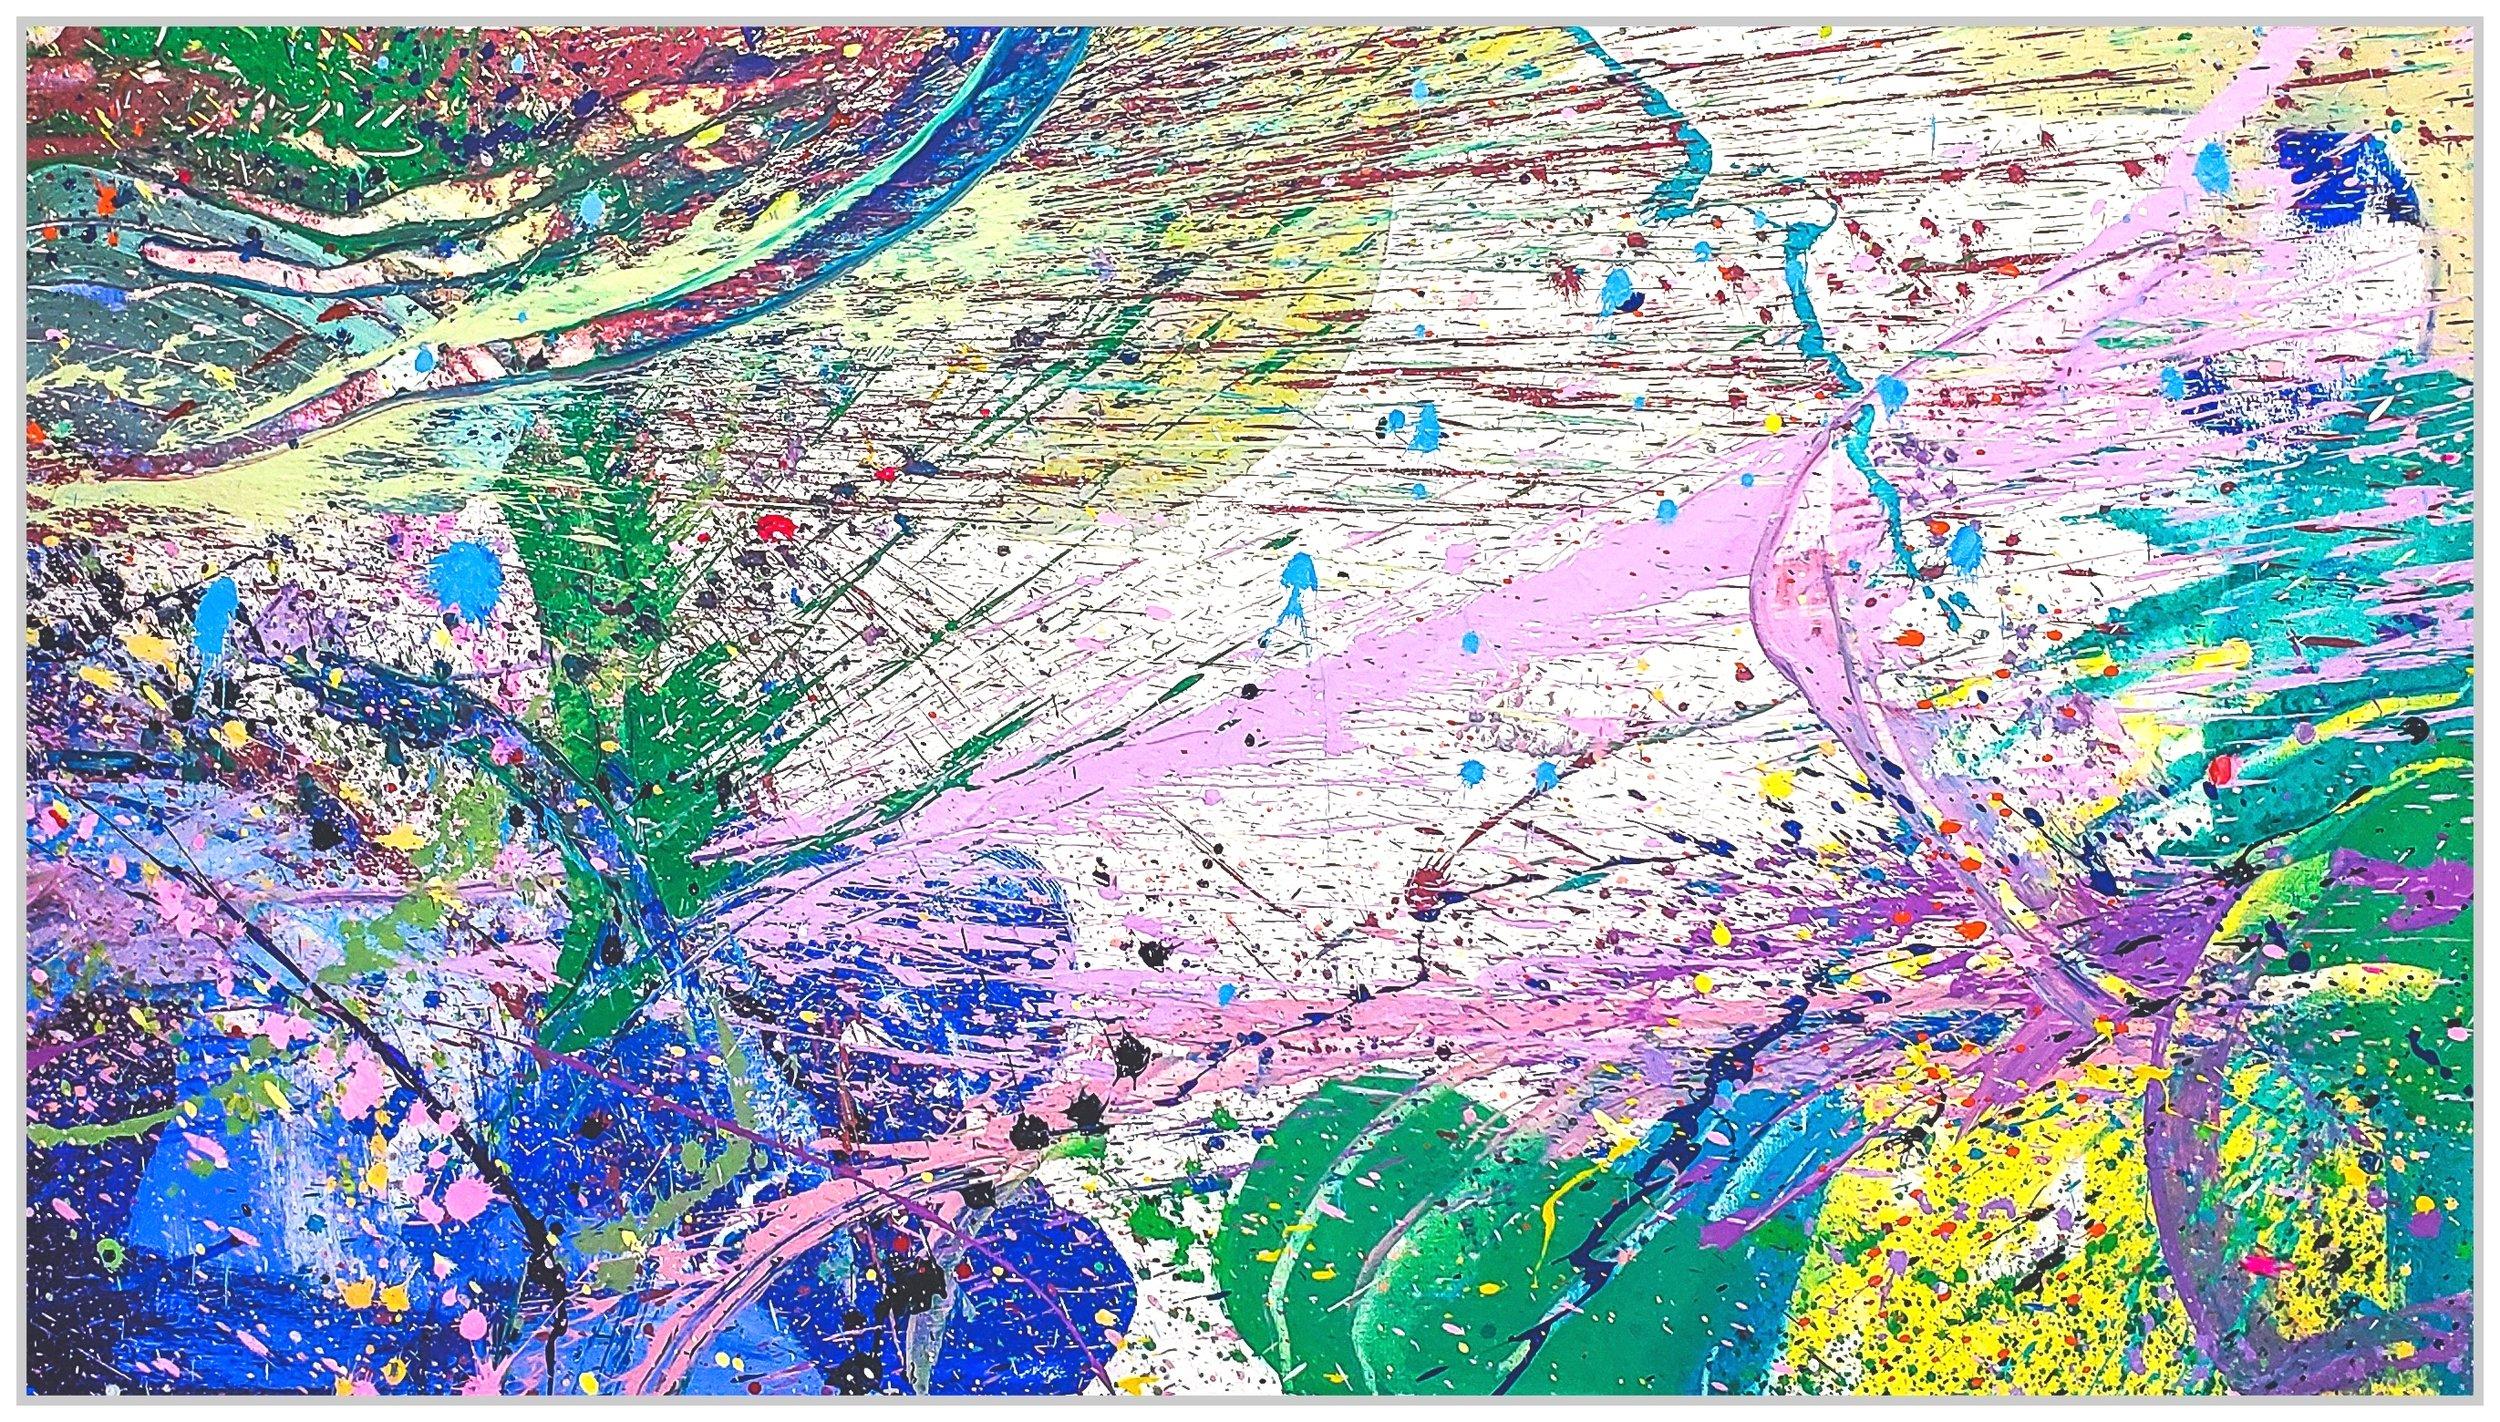 "Napa Valley #86, 2019, acrylic on canvas, 36"" x 68"" (91.4 x 173 cm) in Seoul, Korea"